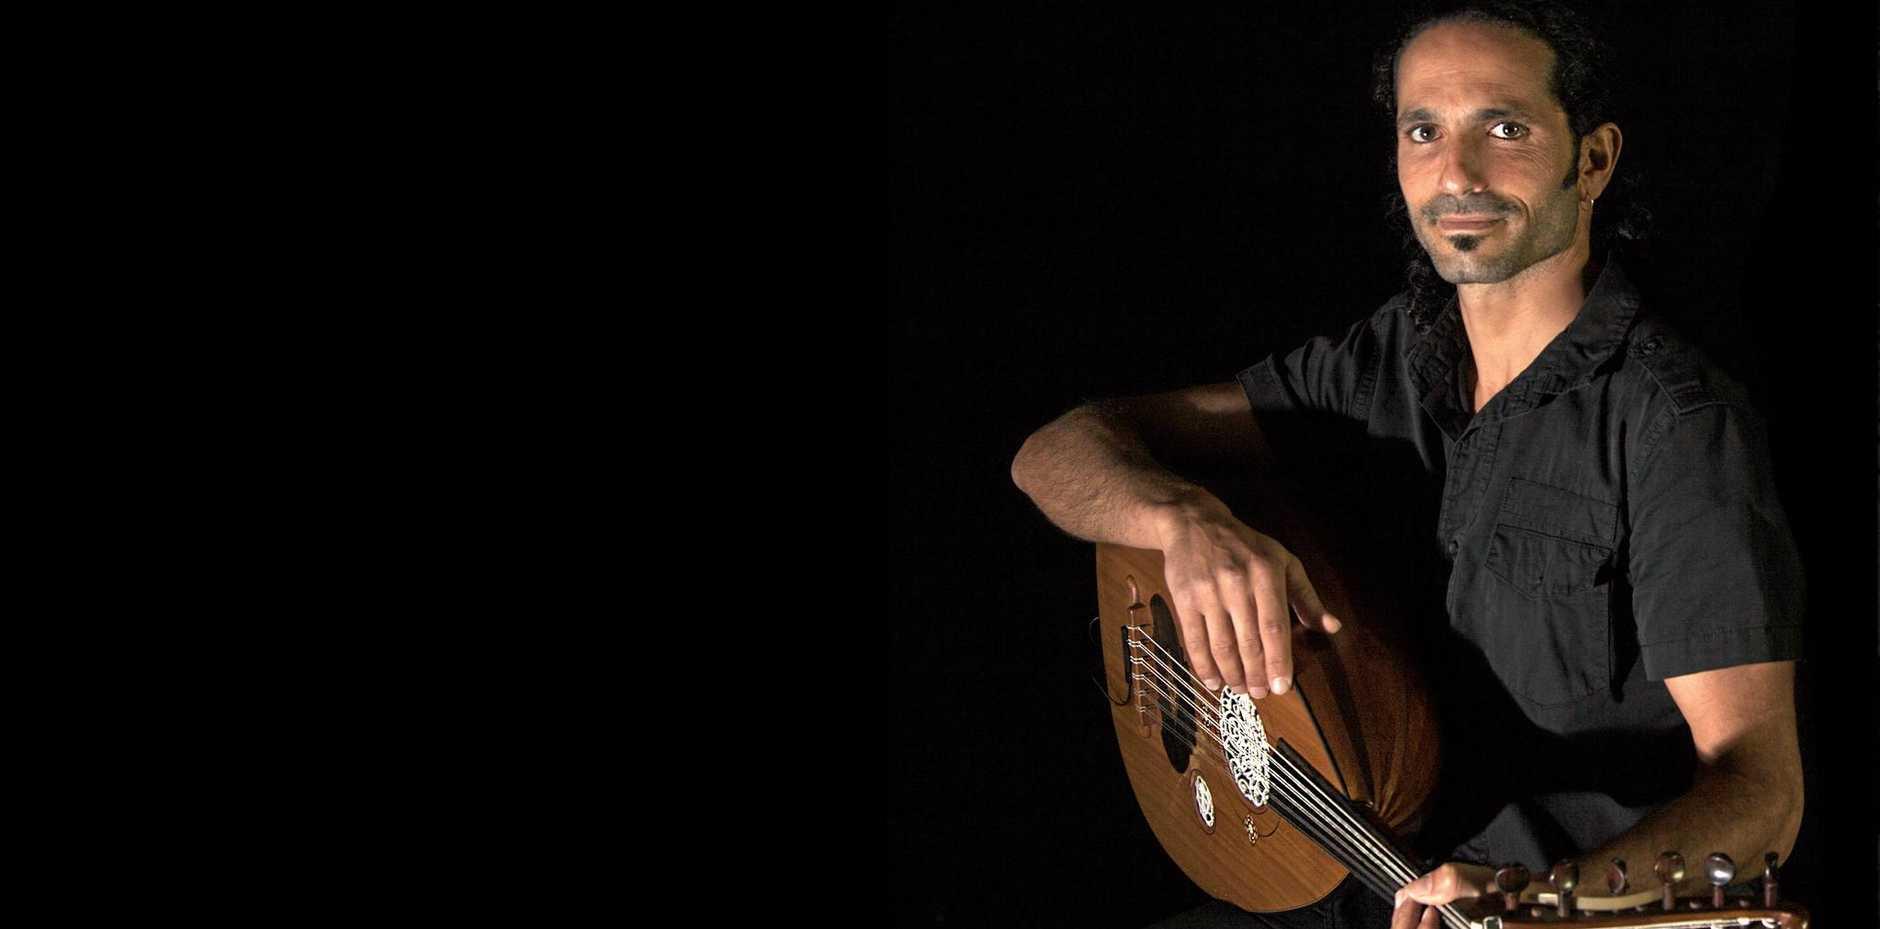 LOCAL: Byron Bay artist Shai Shriki is preparing a brand new album of world music.